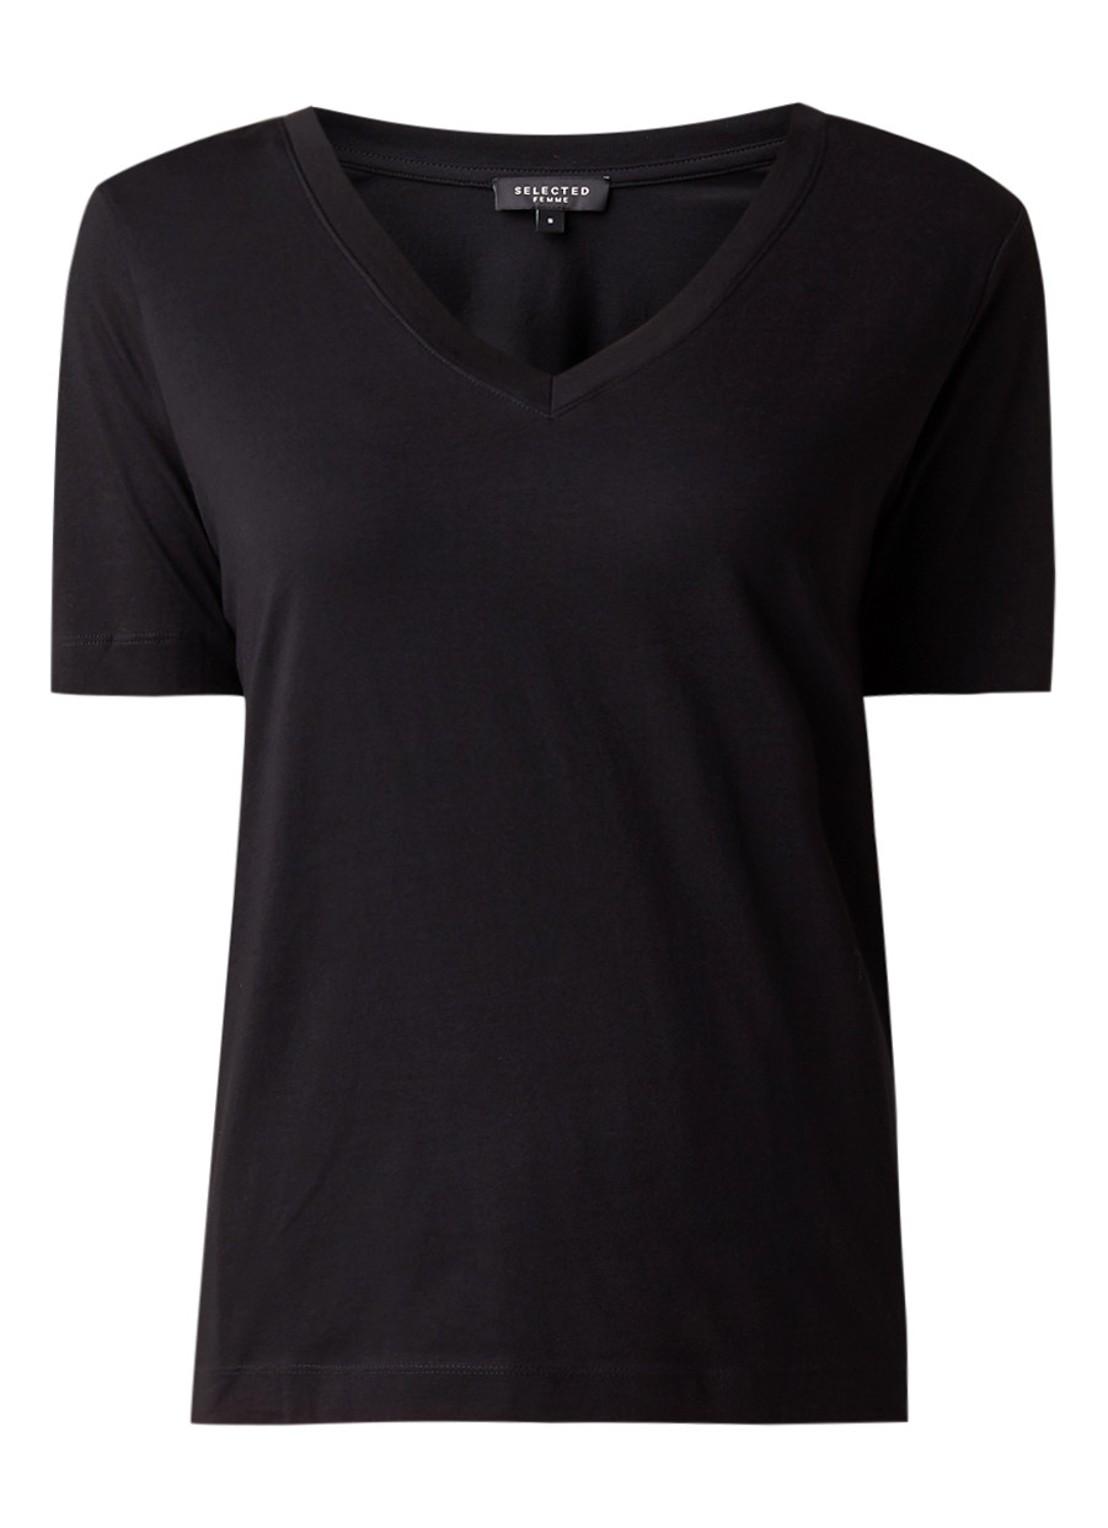 Standard organic cotton T-shirt with V-neck